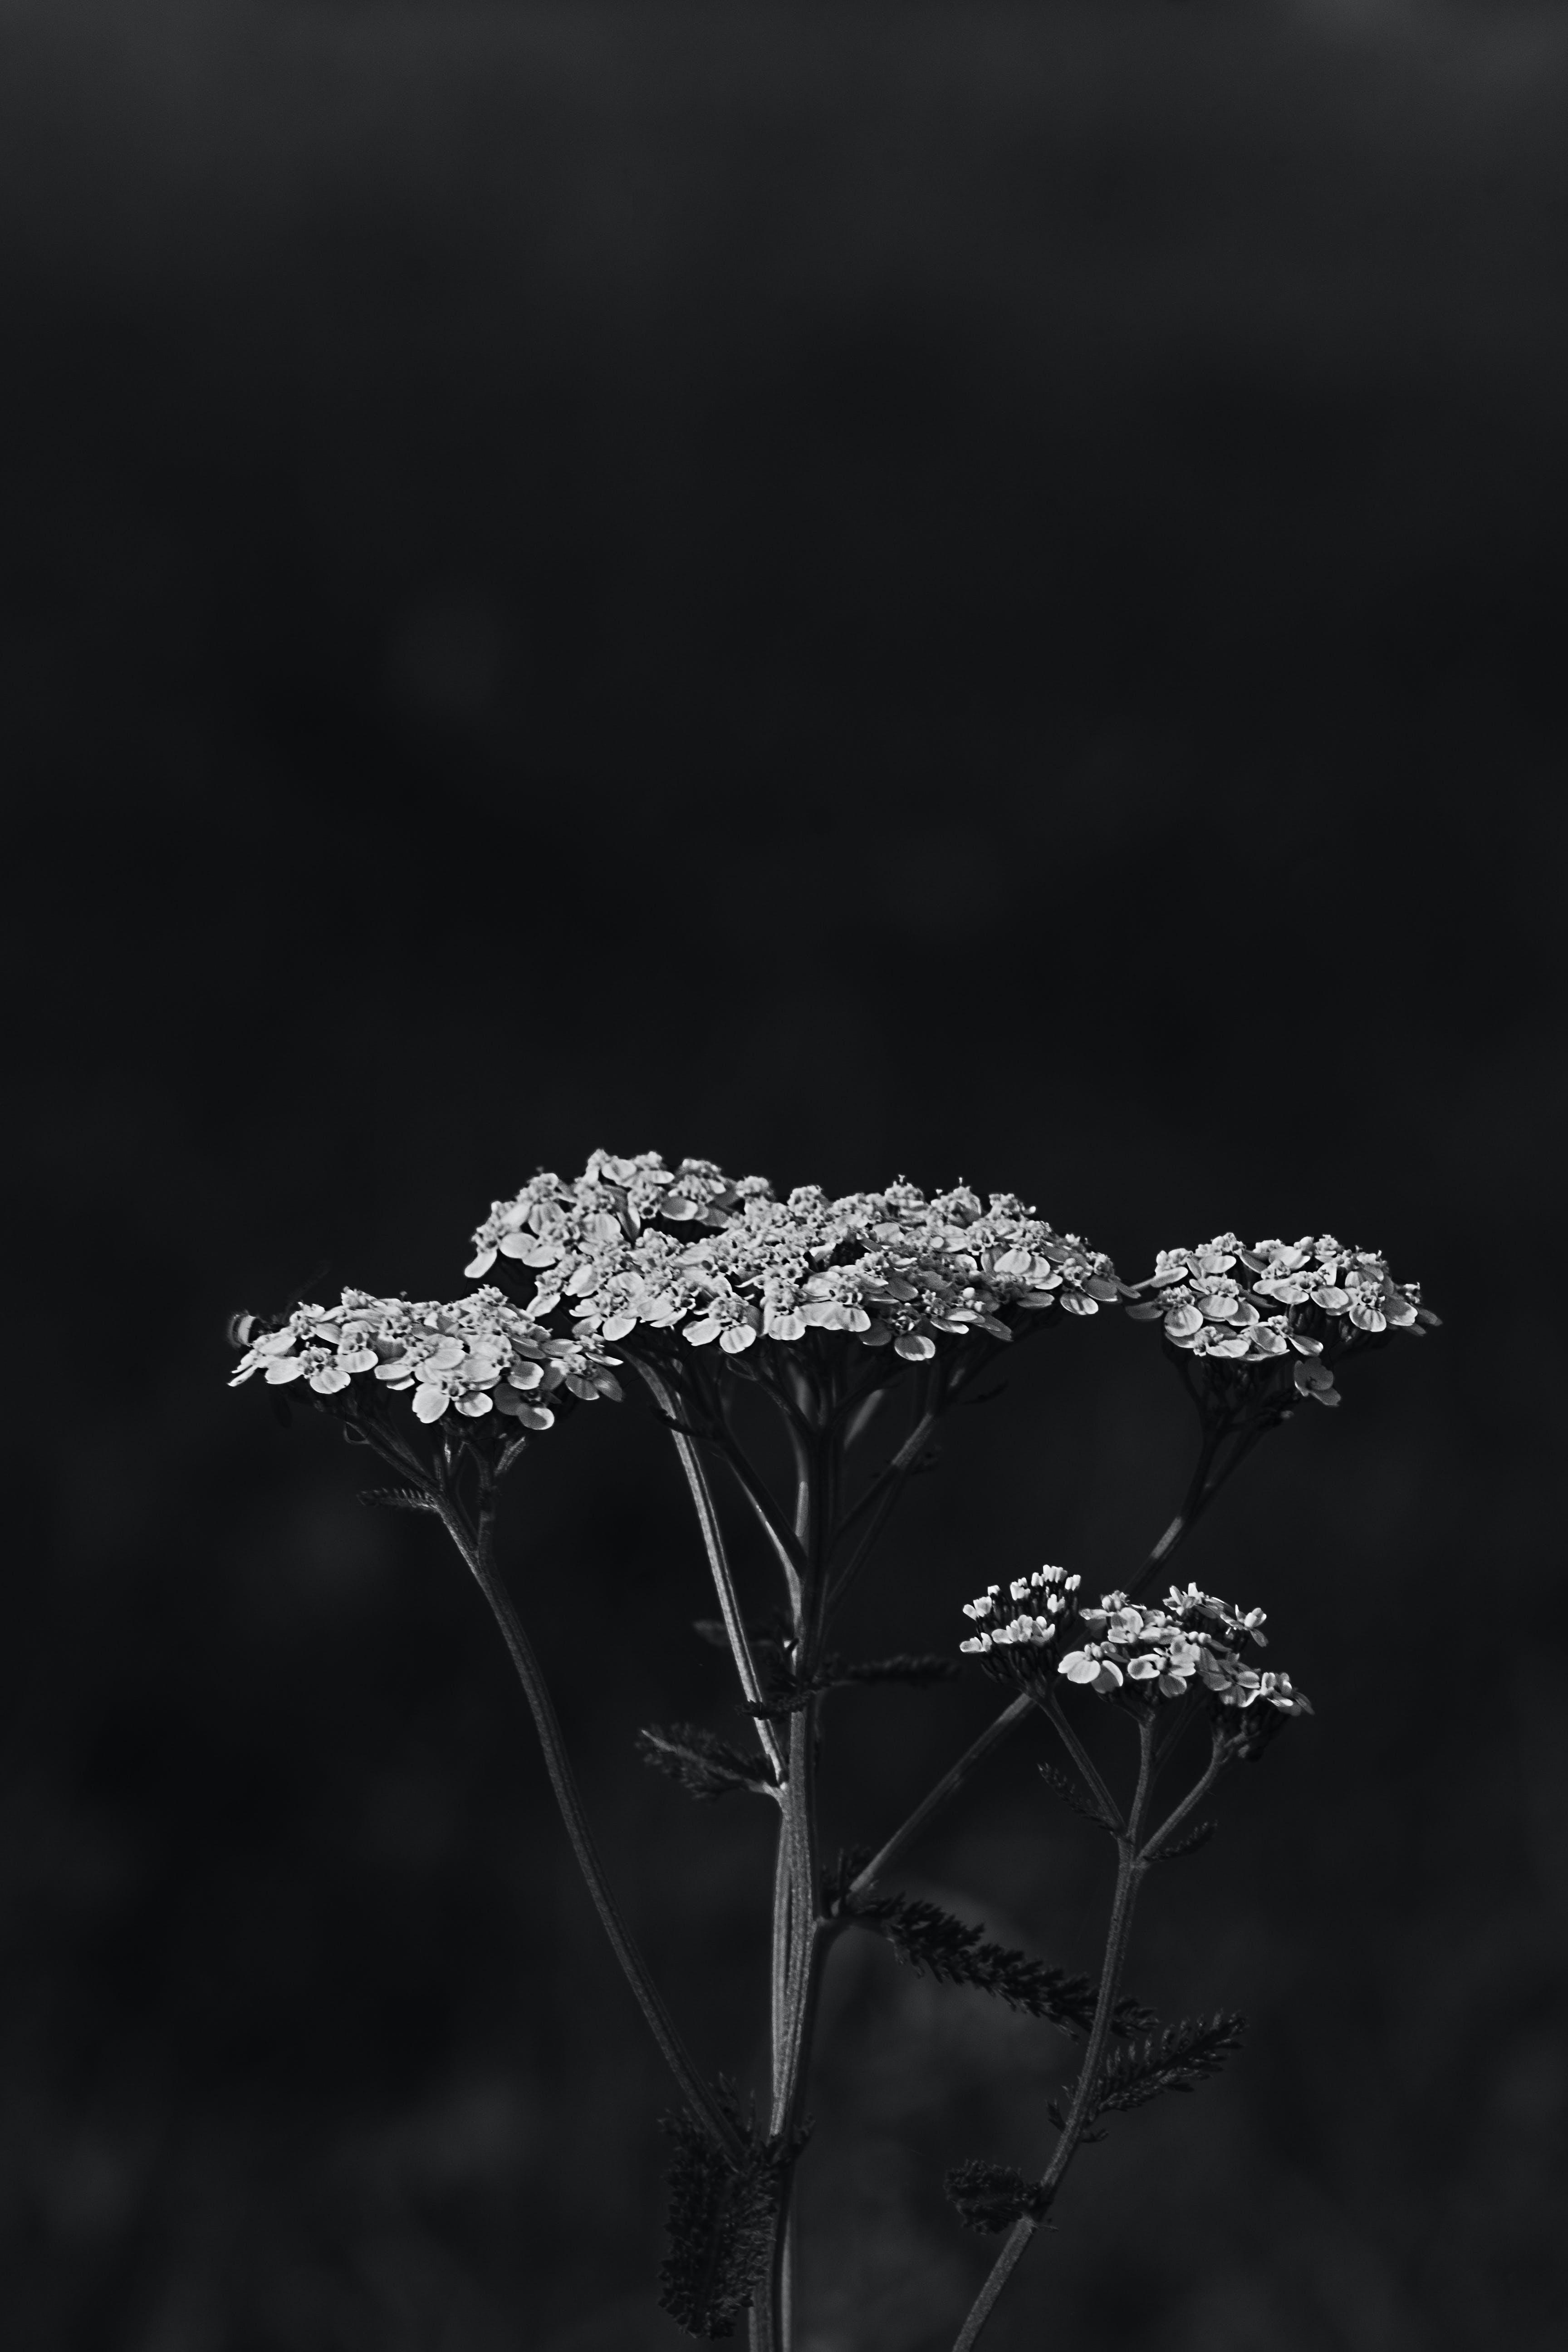 Monochrome Photo of Flowers